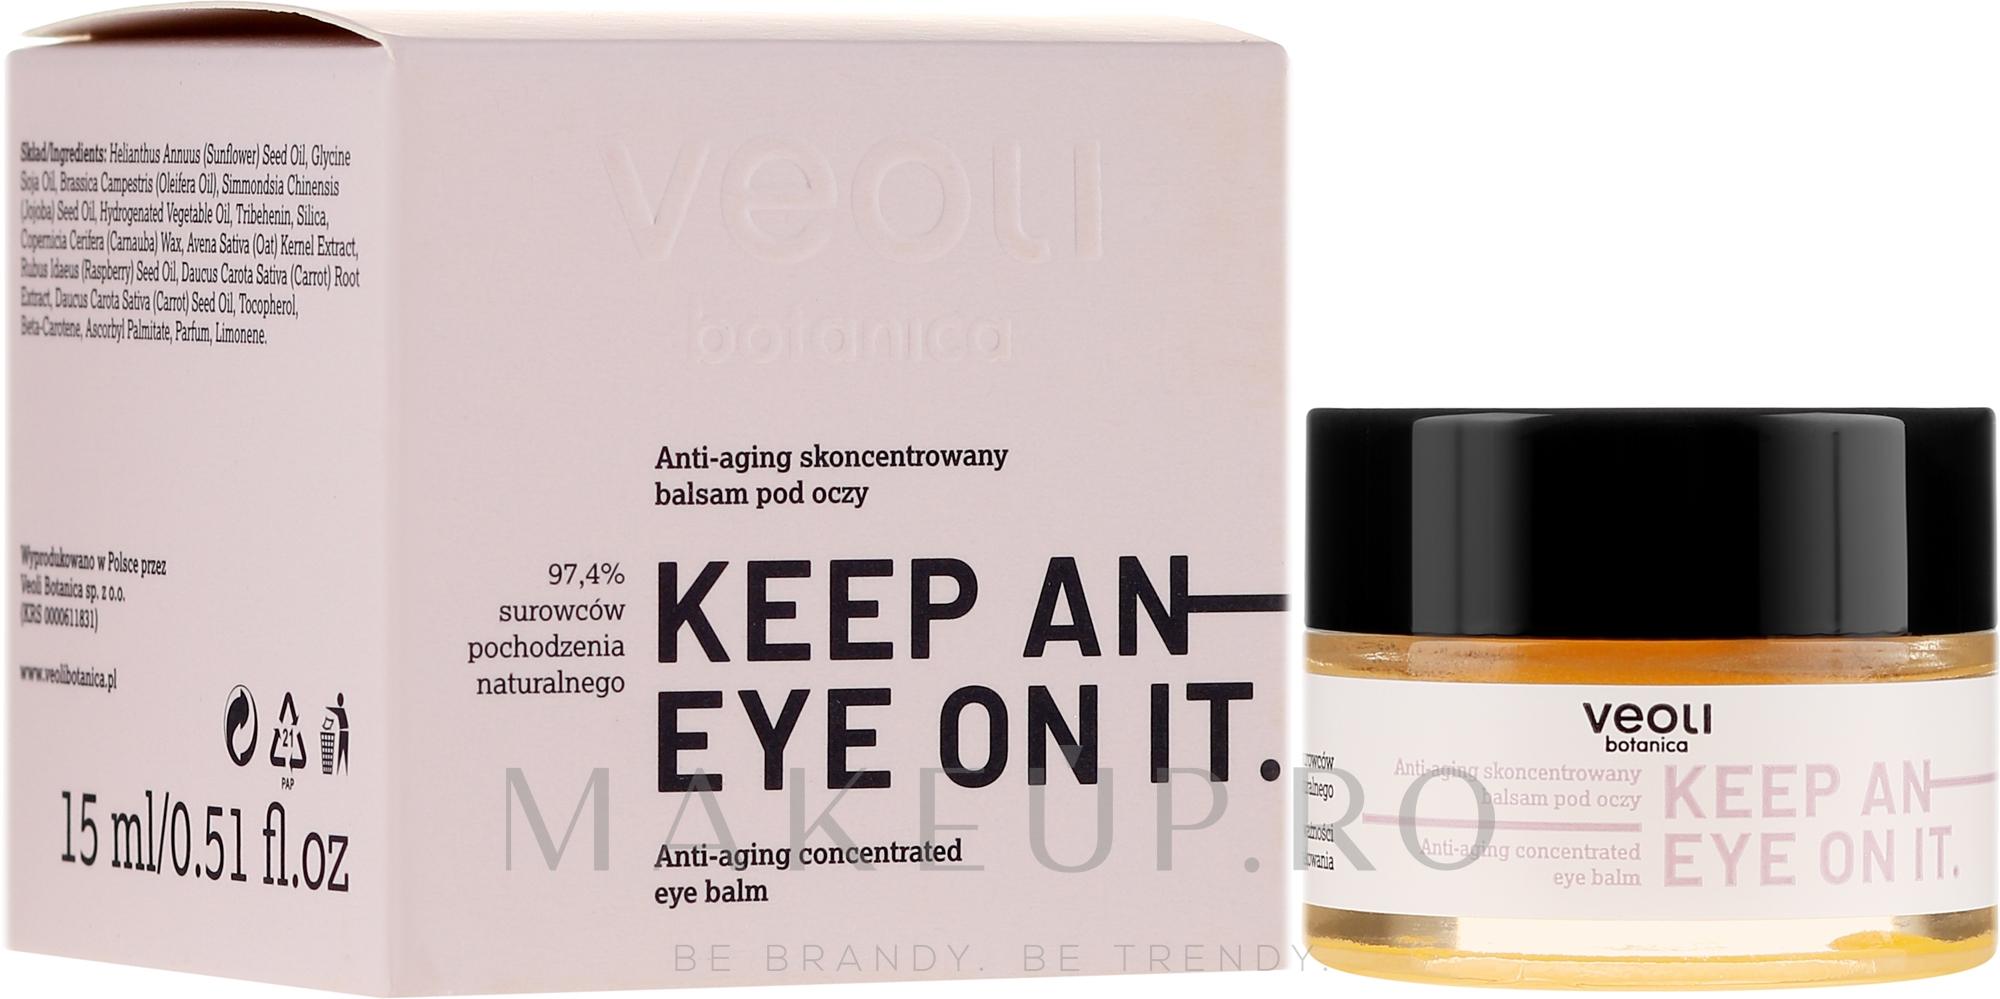 Balsam concentrat anti-îmbătrânire sub ochi - Veoli Botanica Anti-aging Concentrated Eye Balm Keep An Eye On It — Imagine 15 ml